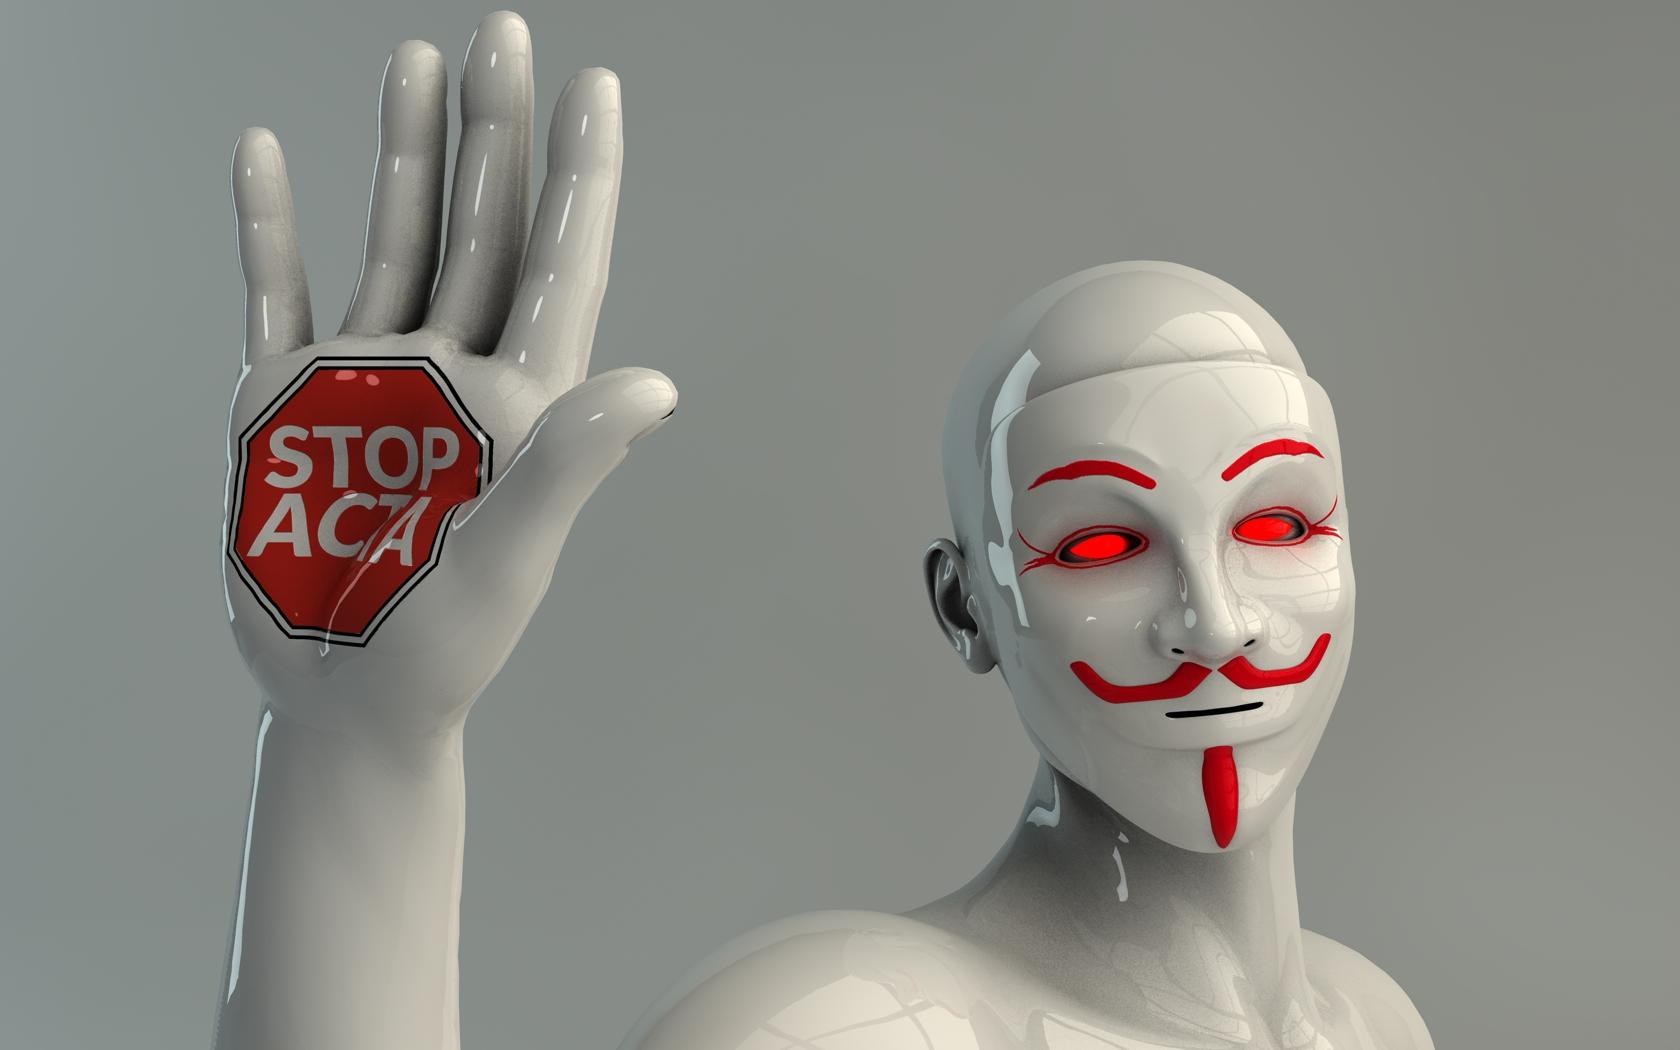 STOP ACTA by Dracu-Teufel666